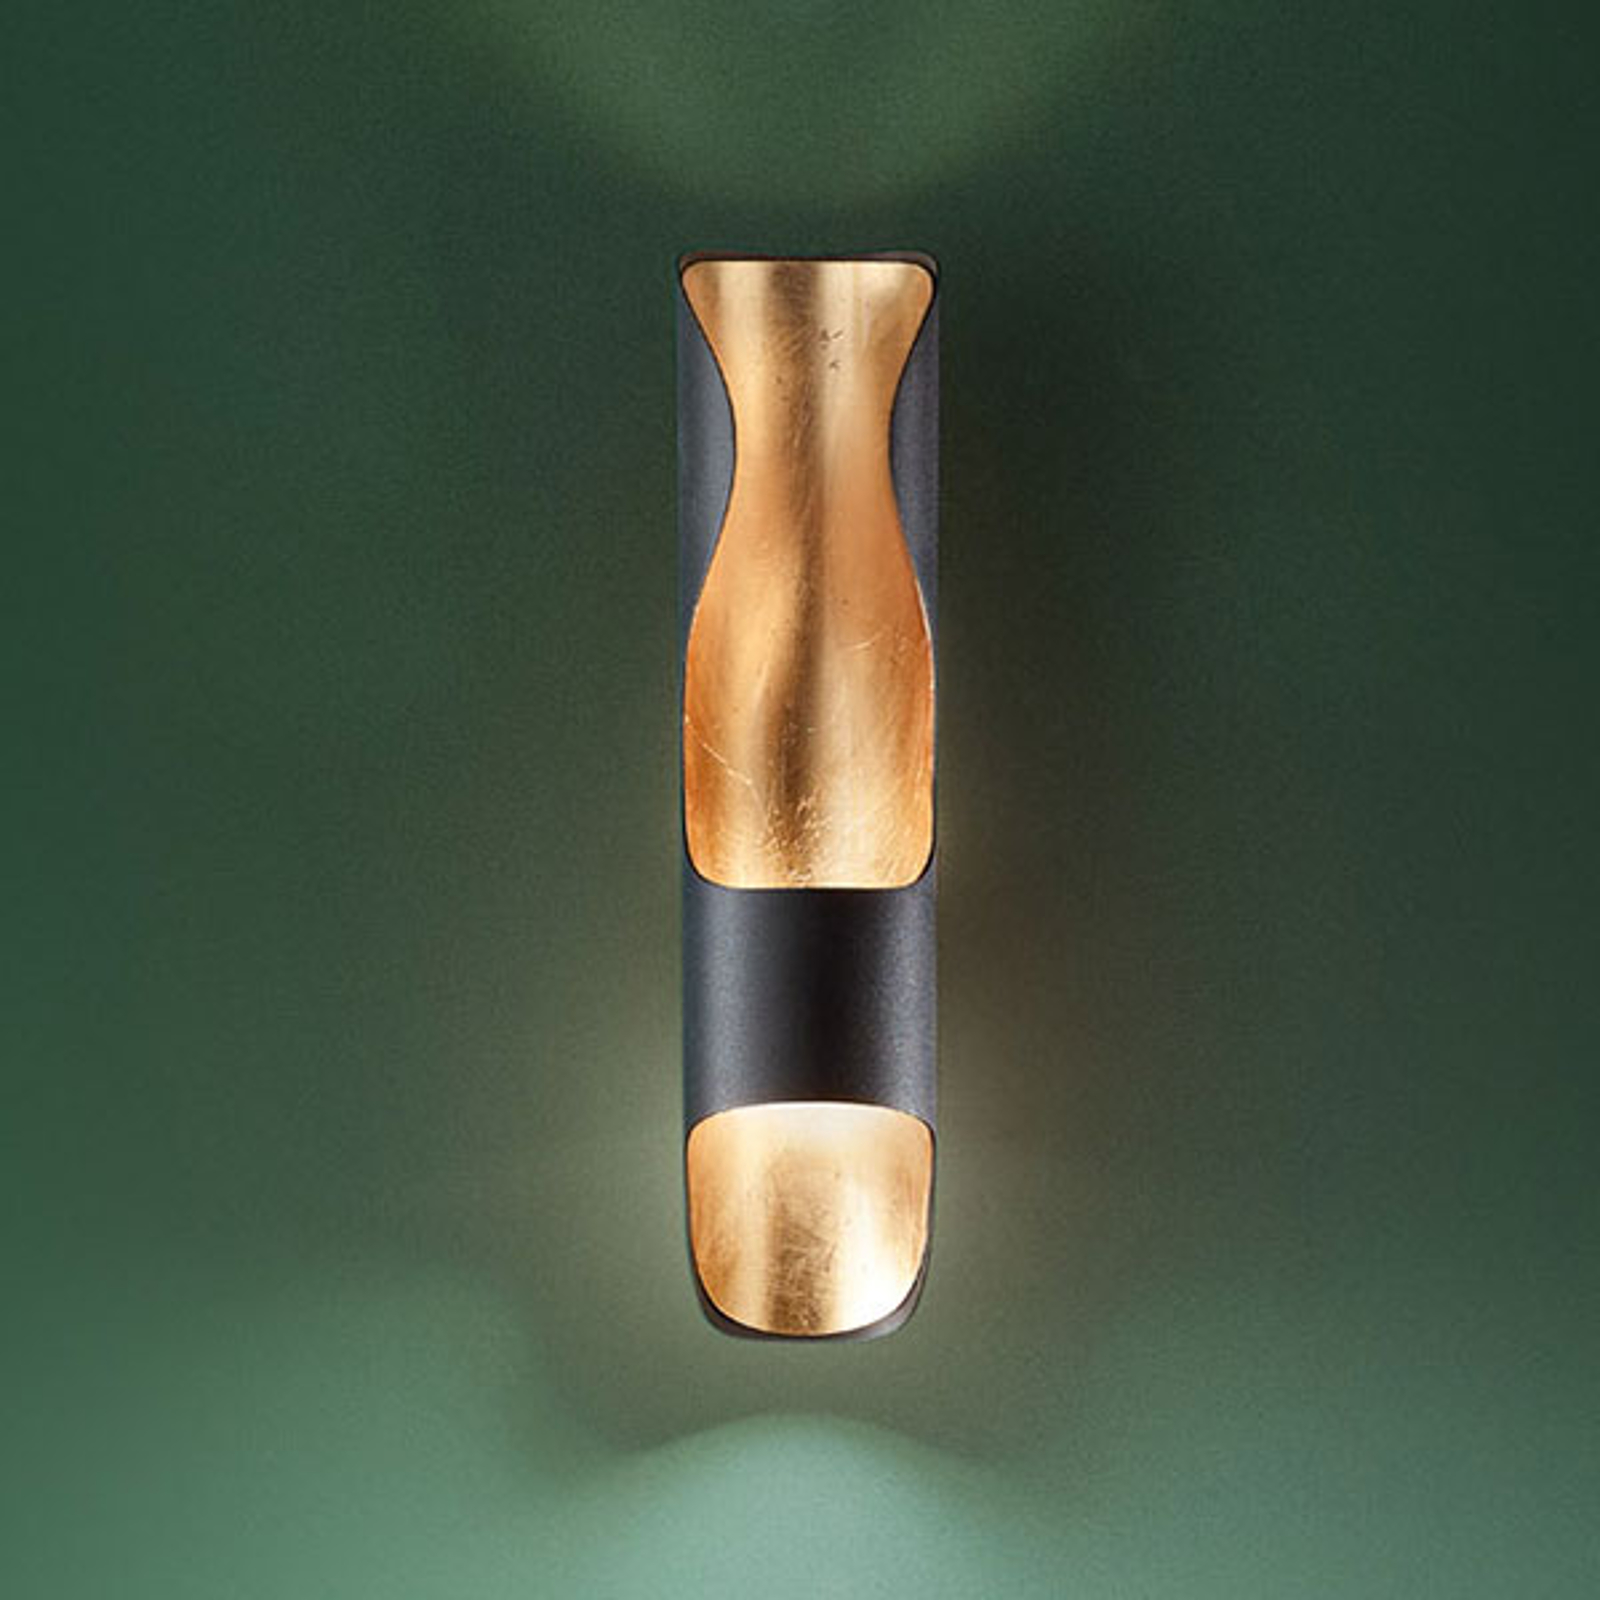 LED-Wandleuchte Kant, schwarz-gold